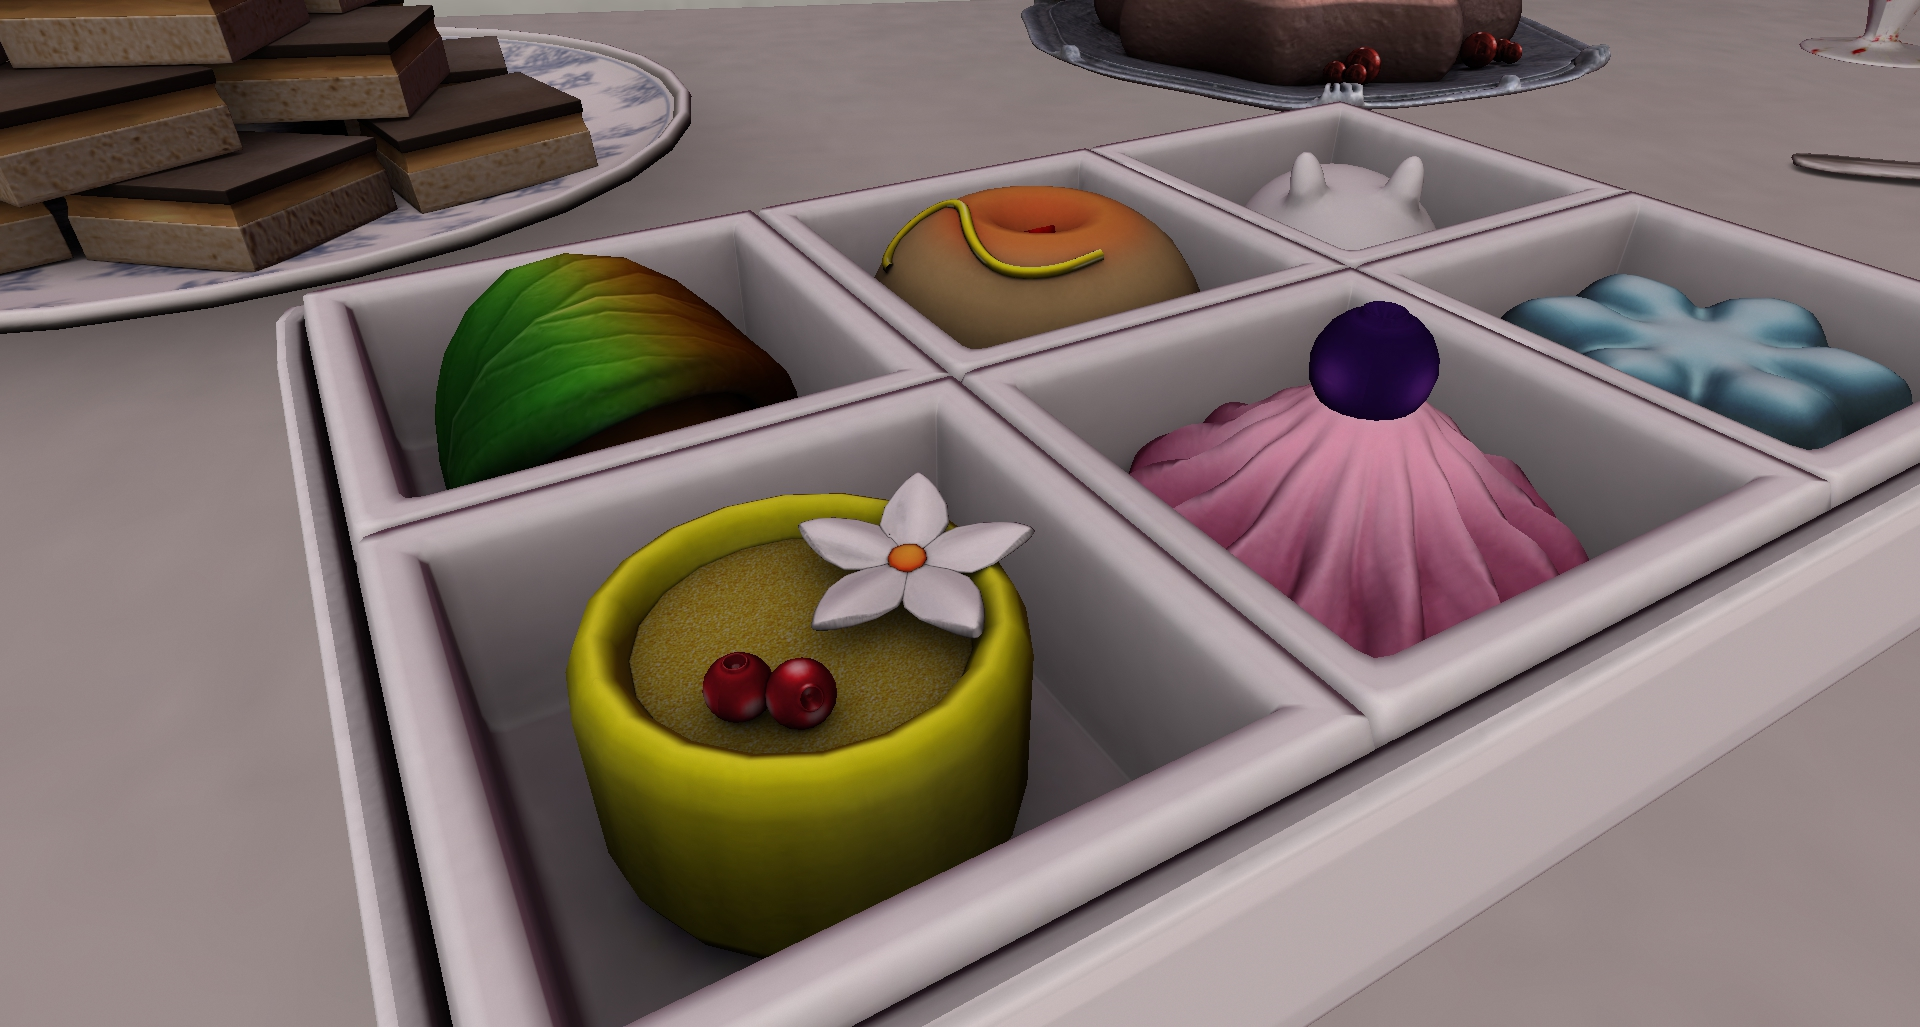 Patisserie Counter cakes - Jan 2019_001.jpg